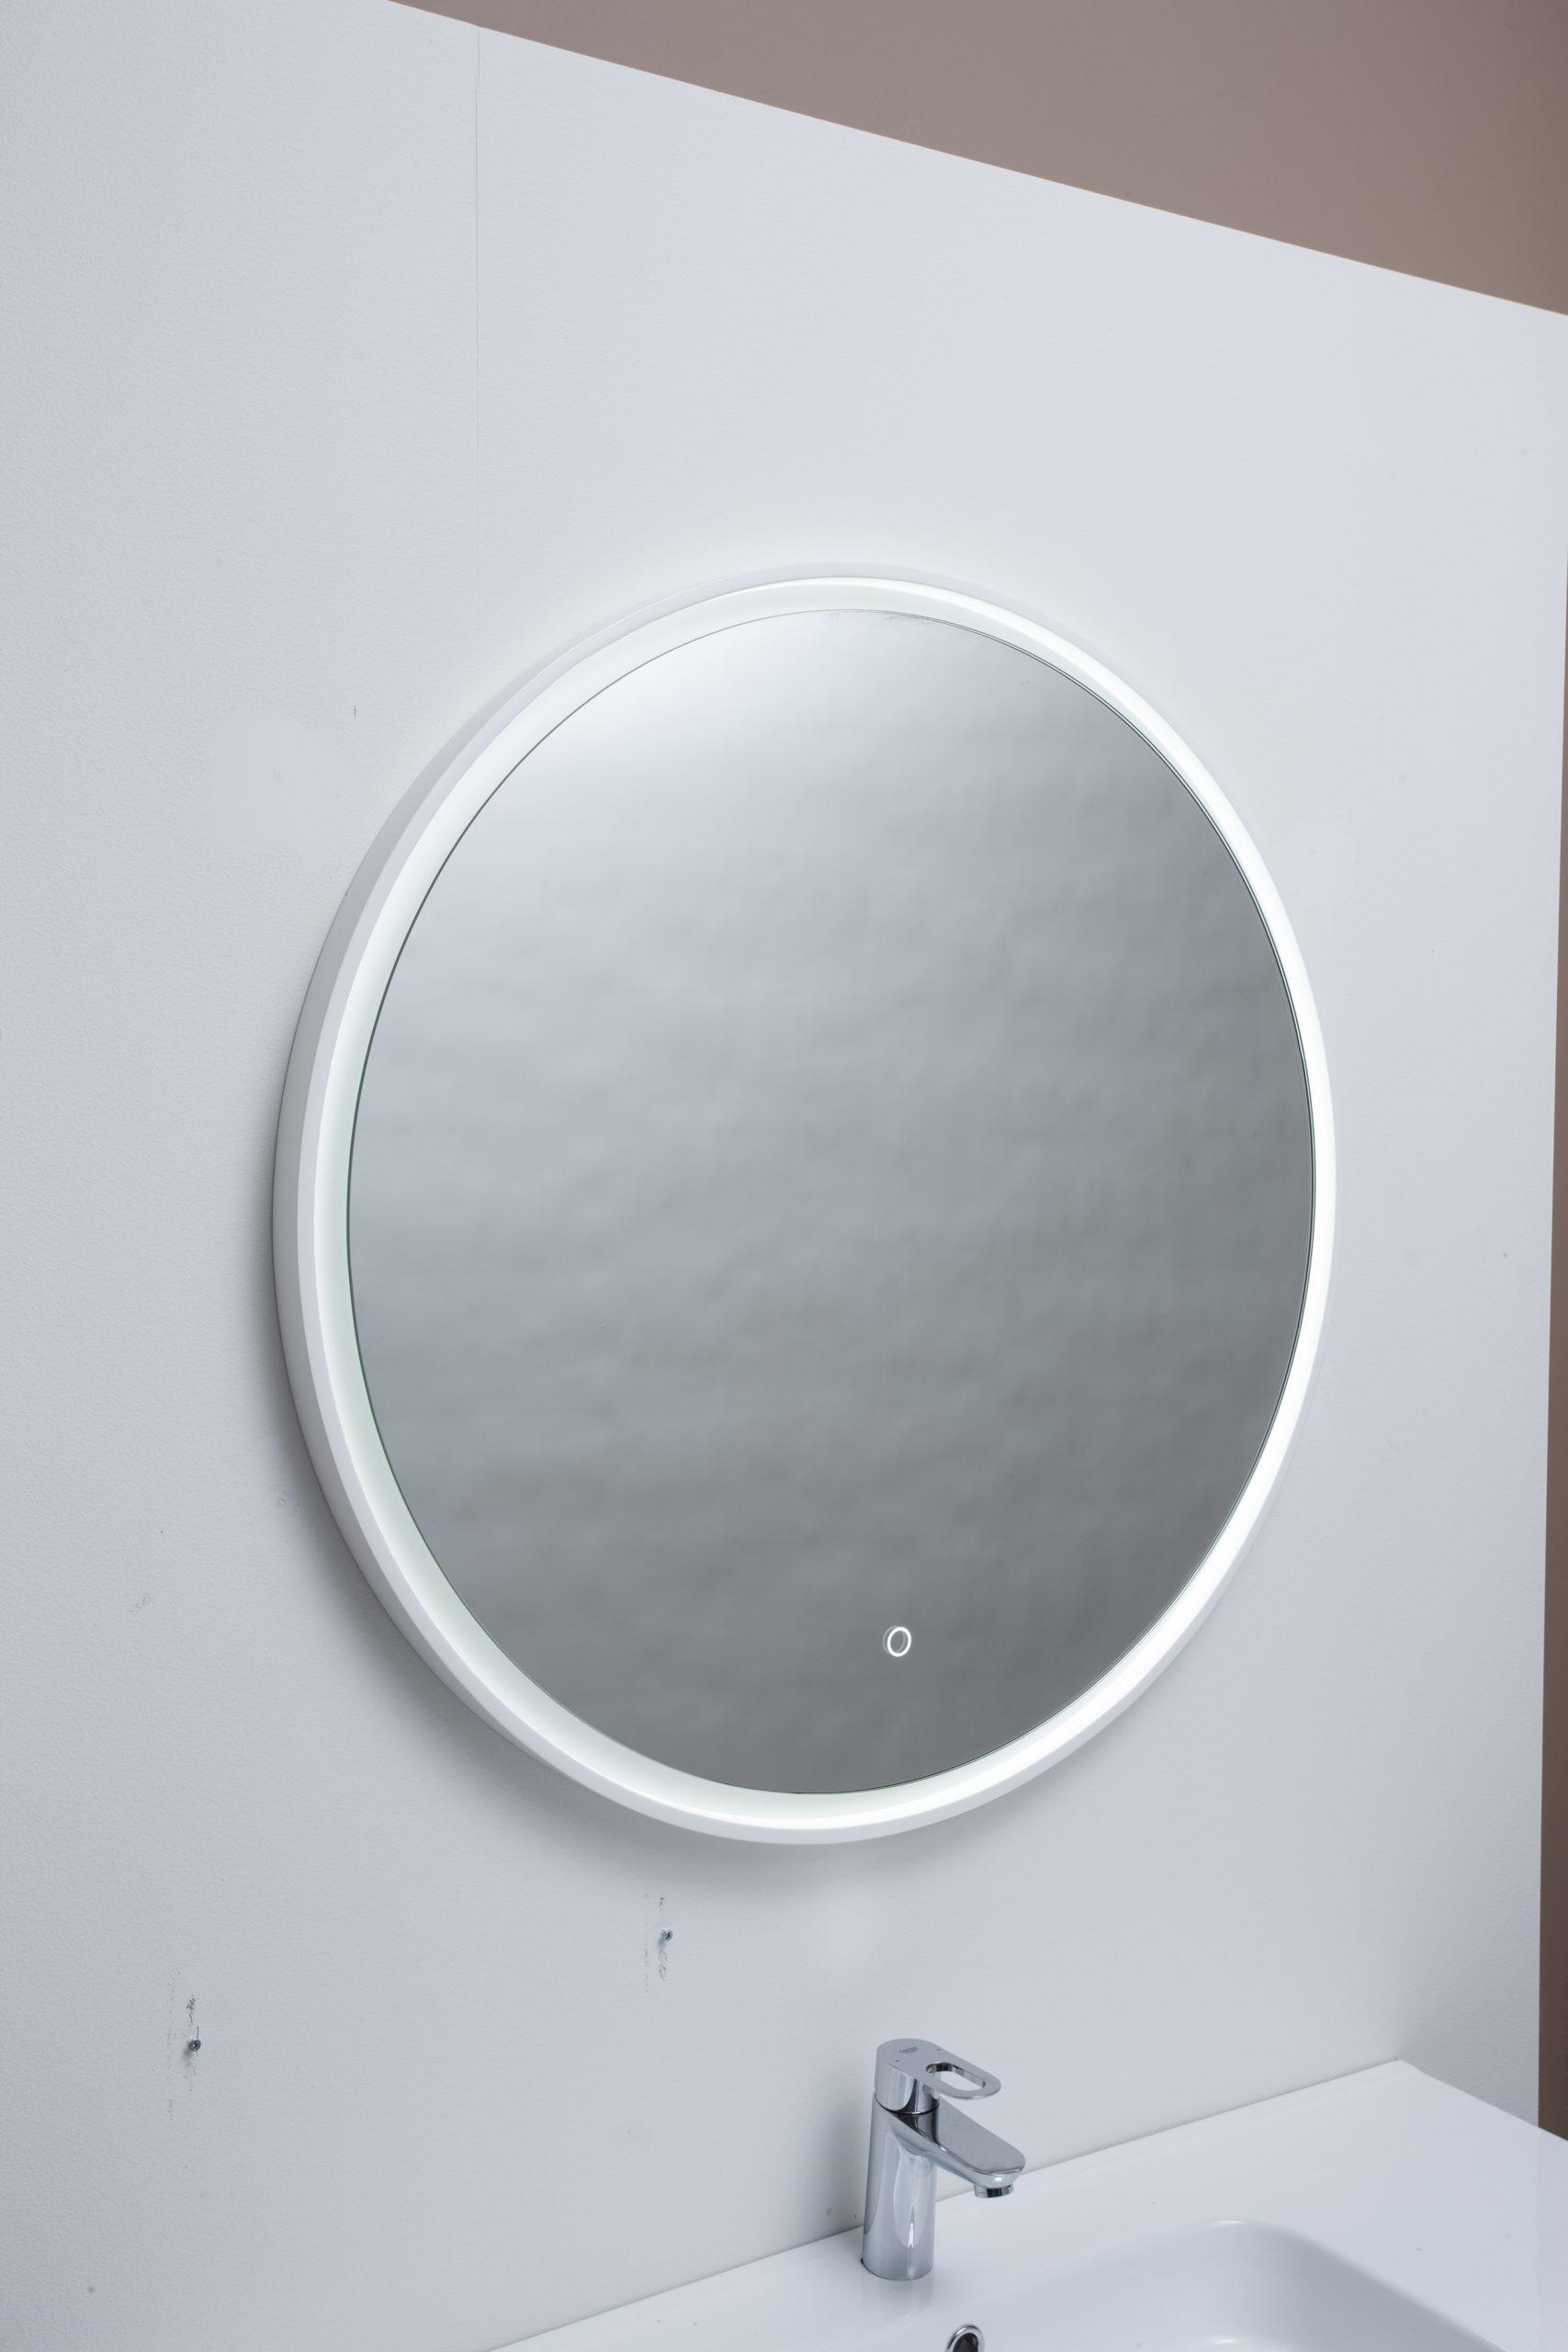 Picture of: Fano Spejl O80 Med Led Lys Ramme Spar 50 Pa Fano Spejl I Ramme